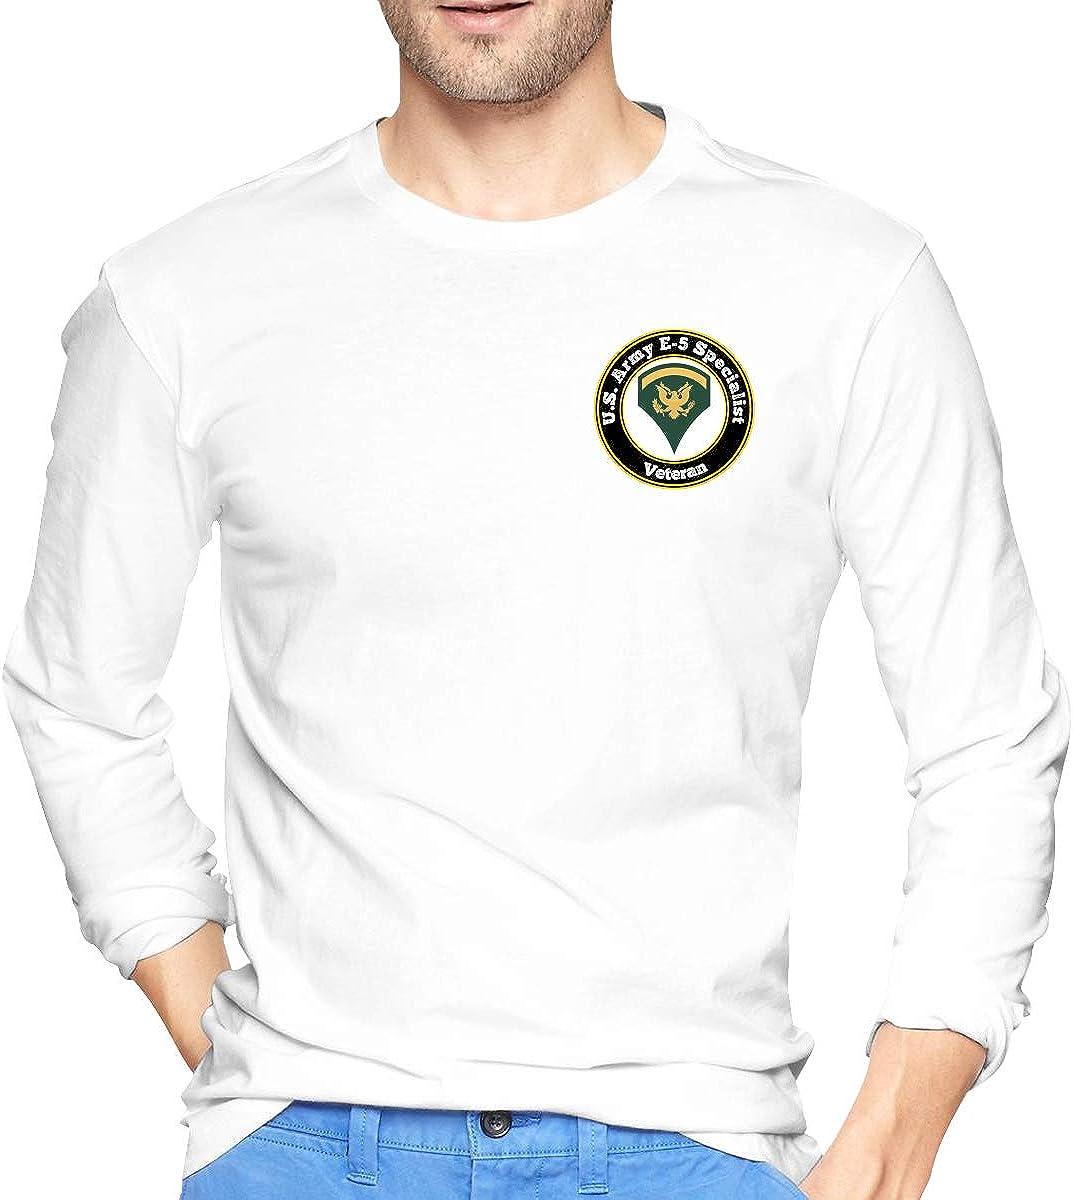 U.S. Army E-5 Specialist Veteran Men's Long Sleeve T-Shirt Cotton T-Shirt Sports T-Shirt